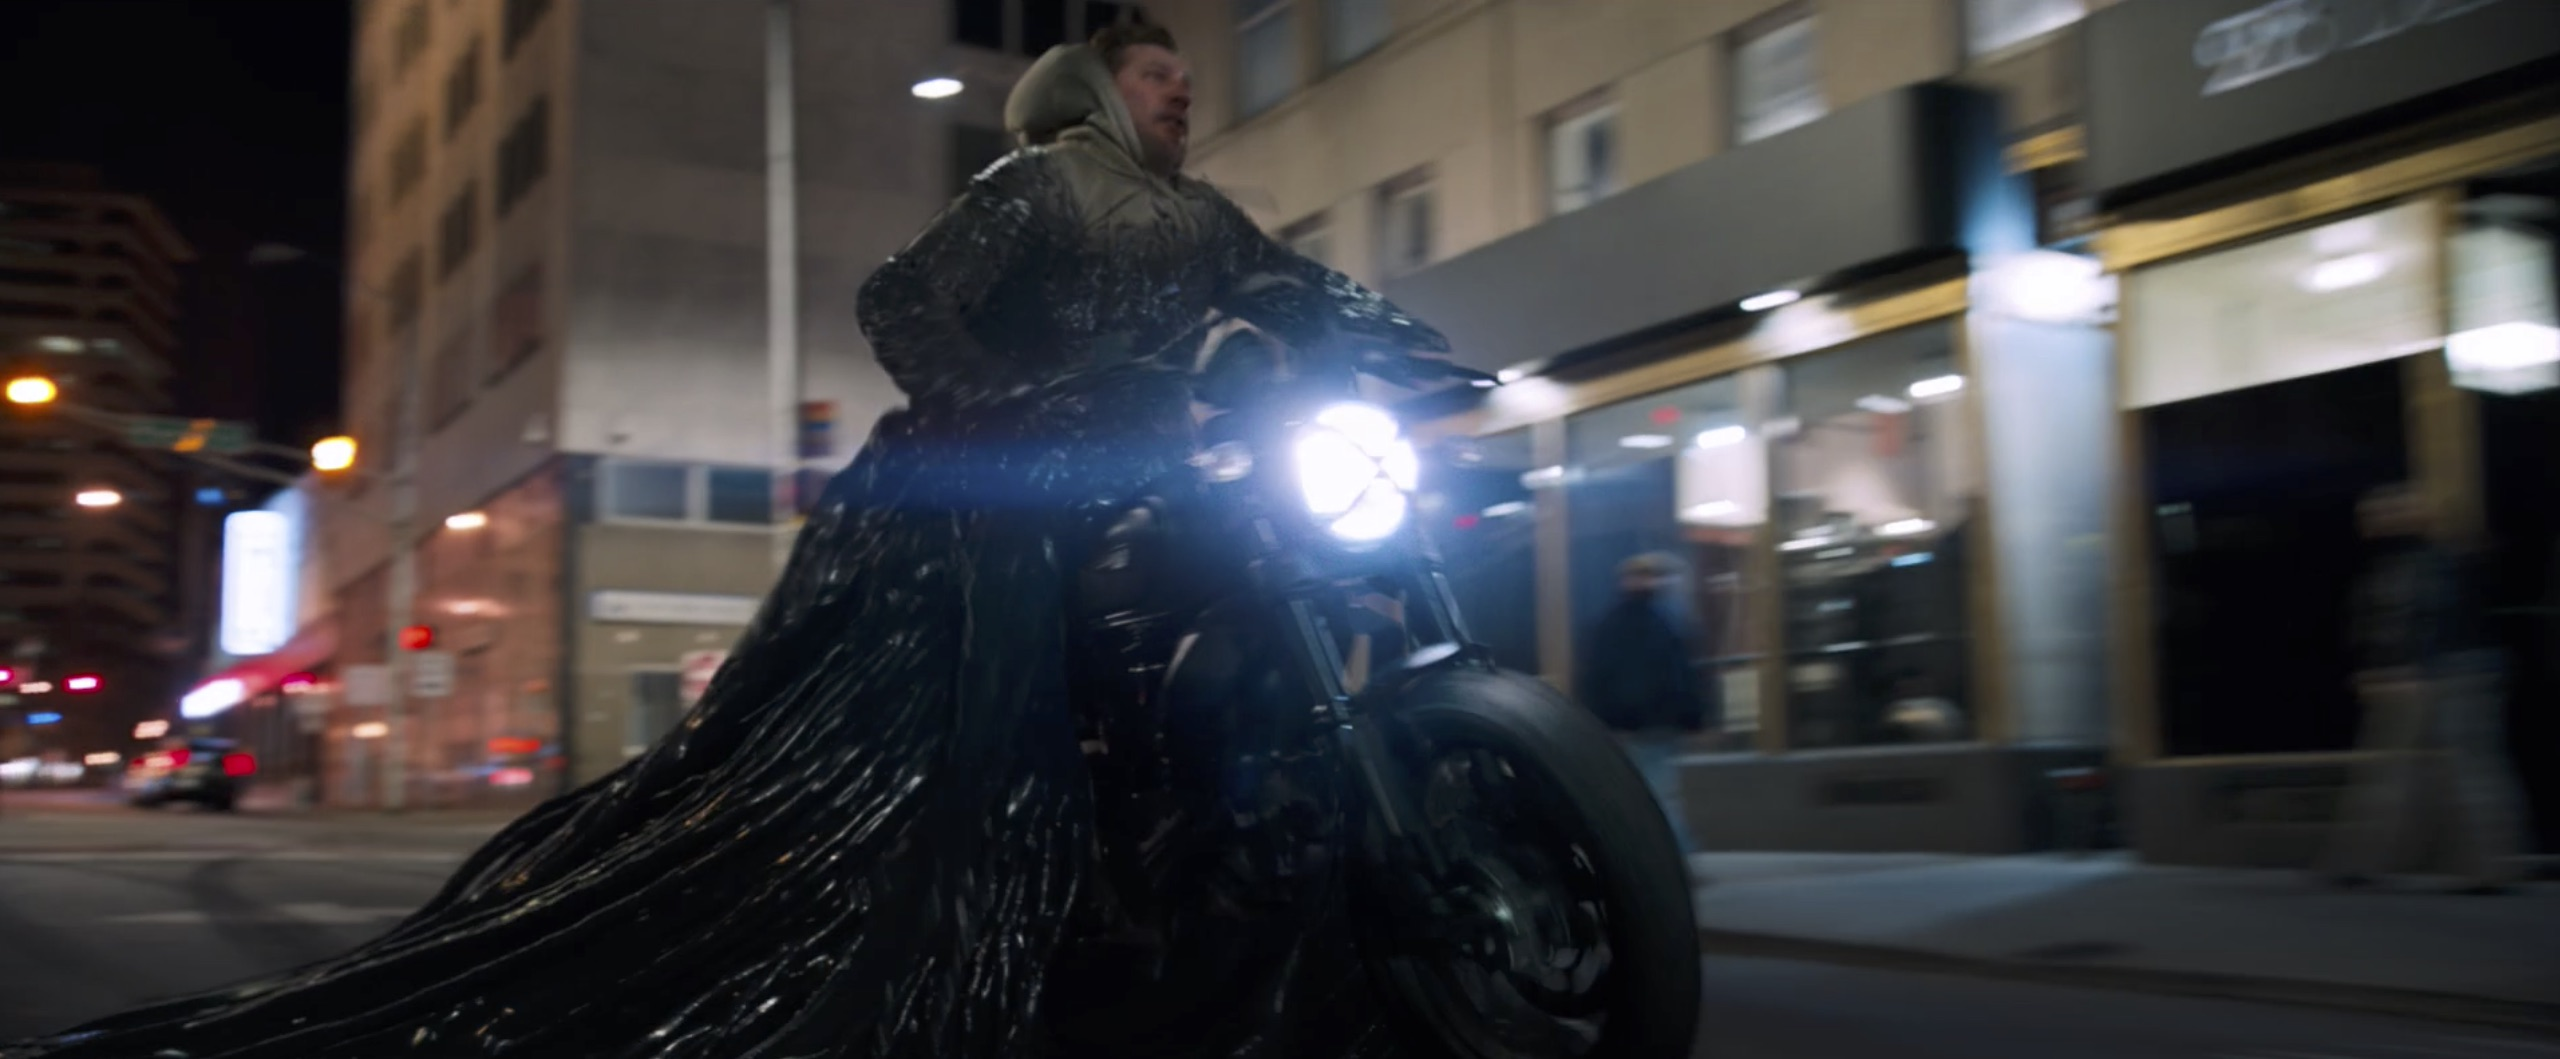 venom motorcycle explosion blue flames